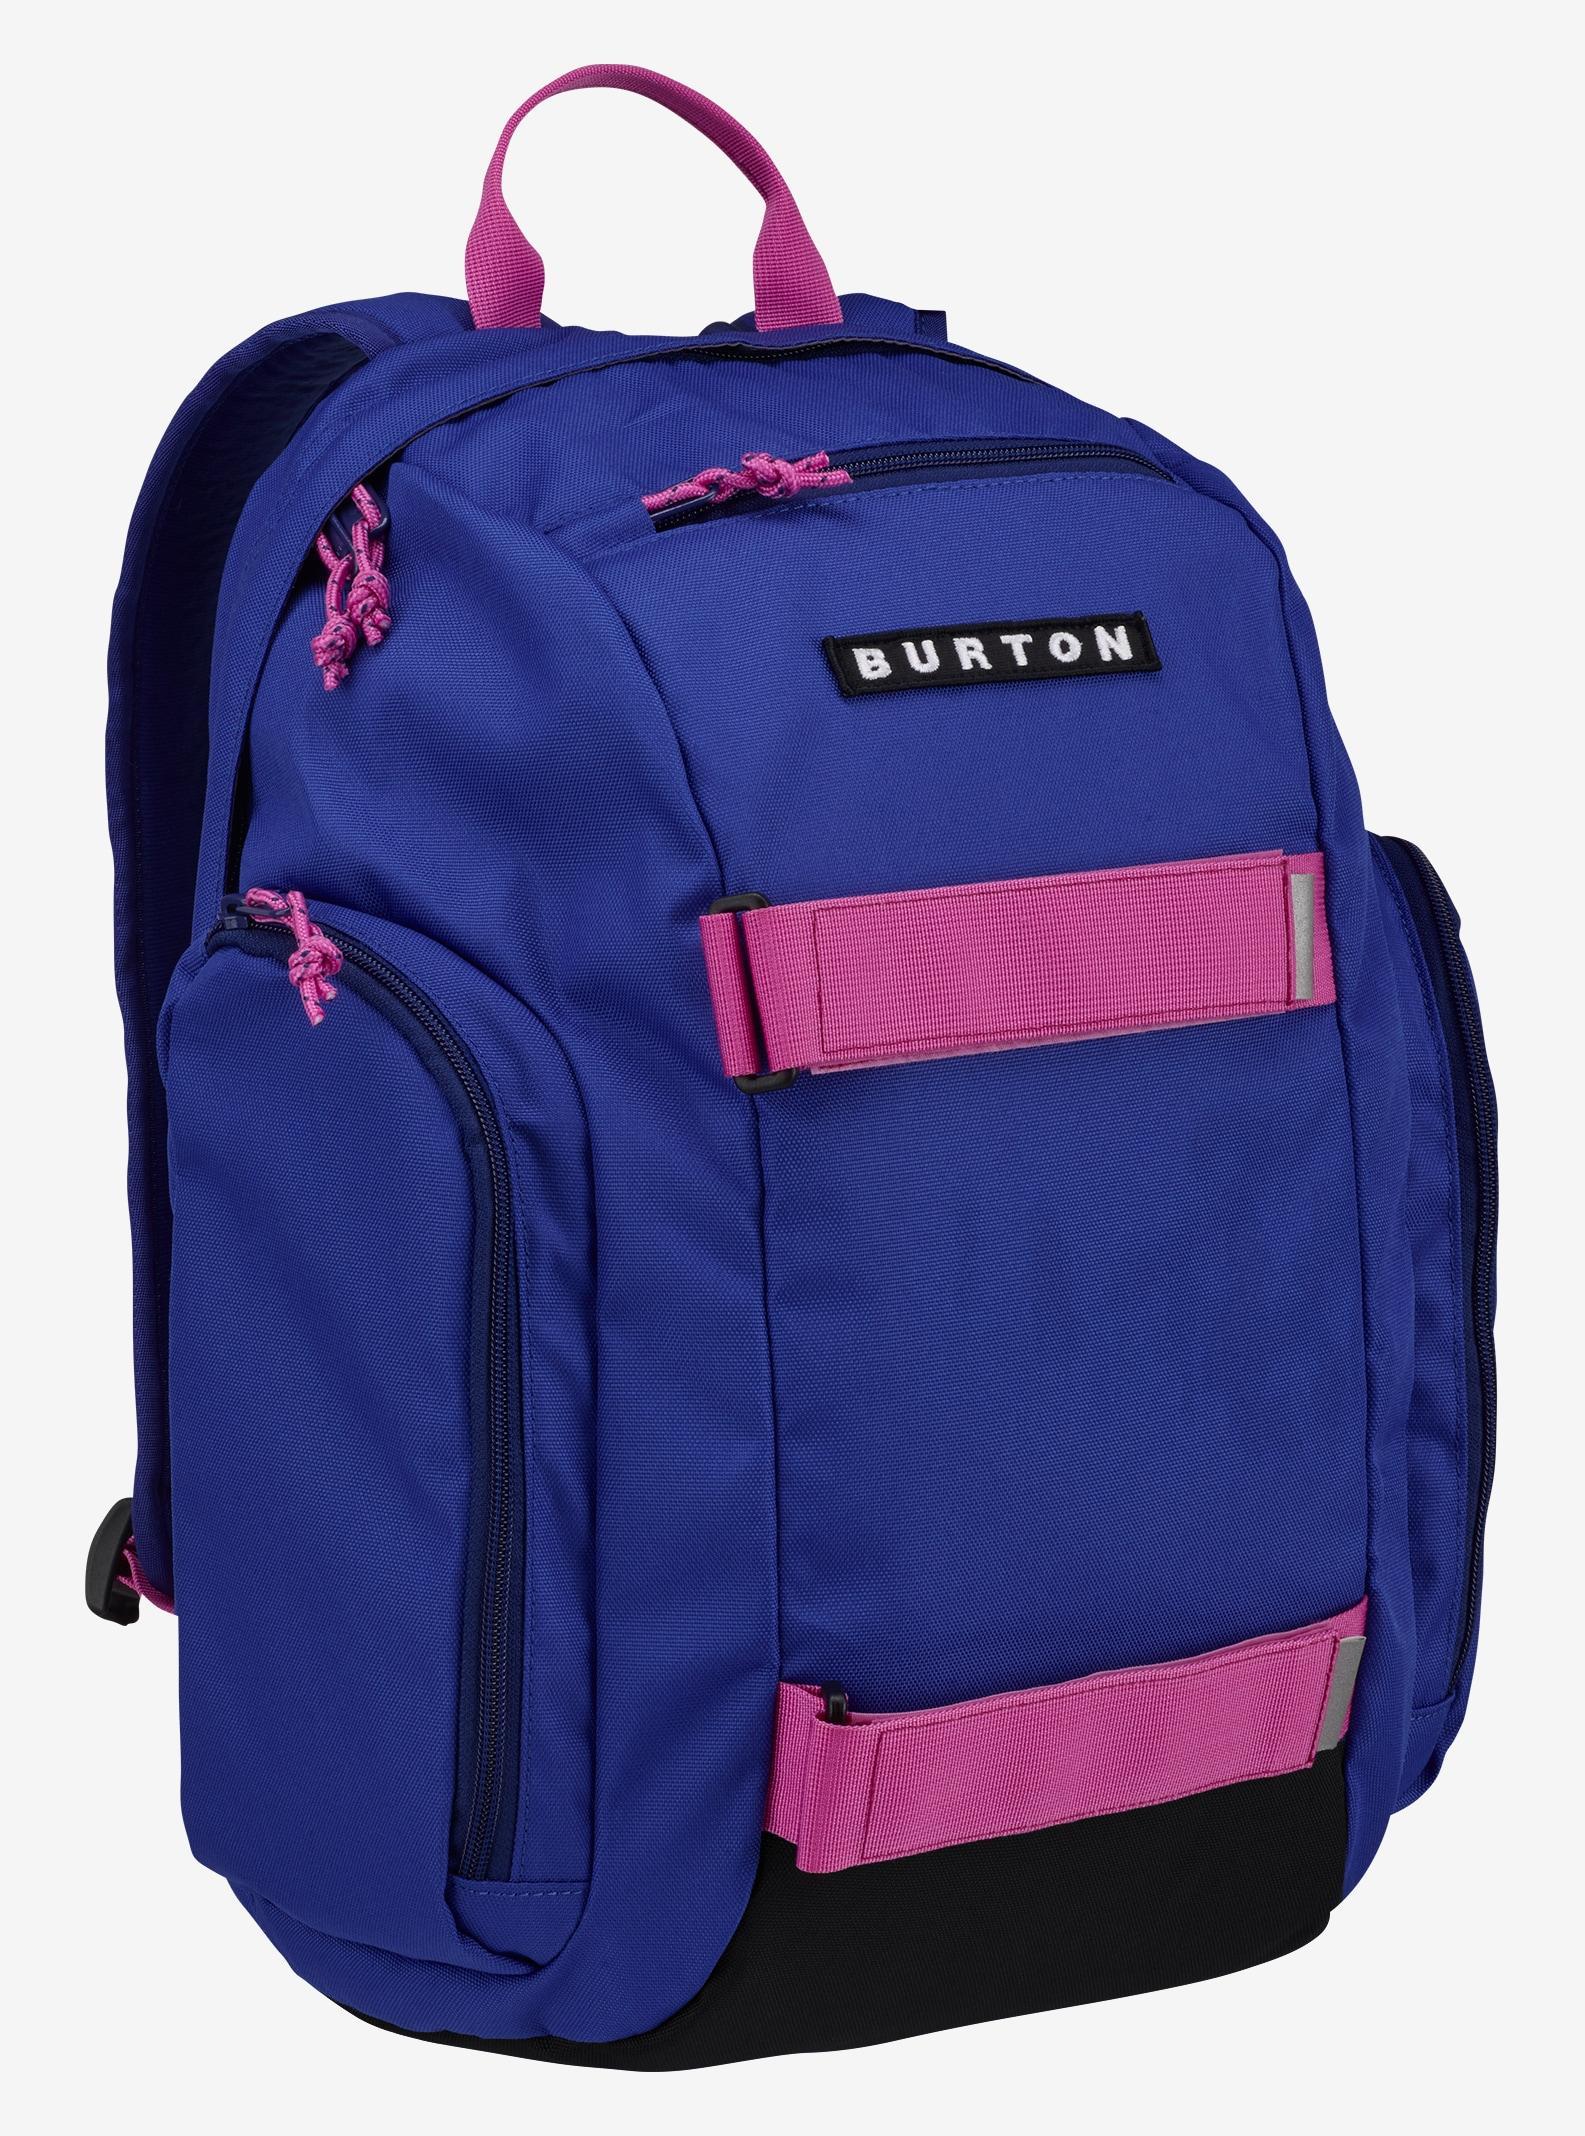 Burton Kids' Metalhead Backpack shown in Sorcerer Spell